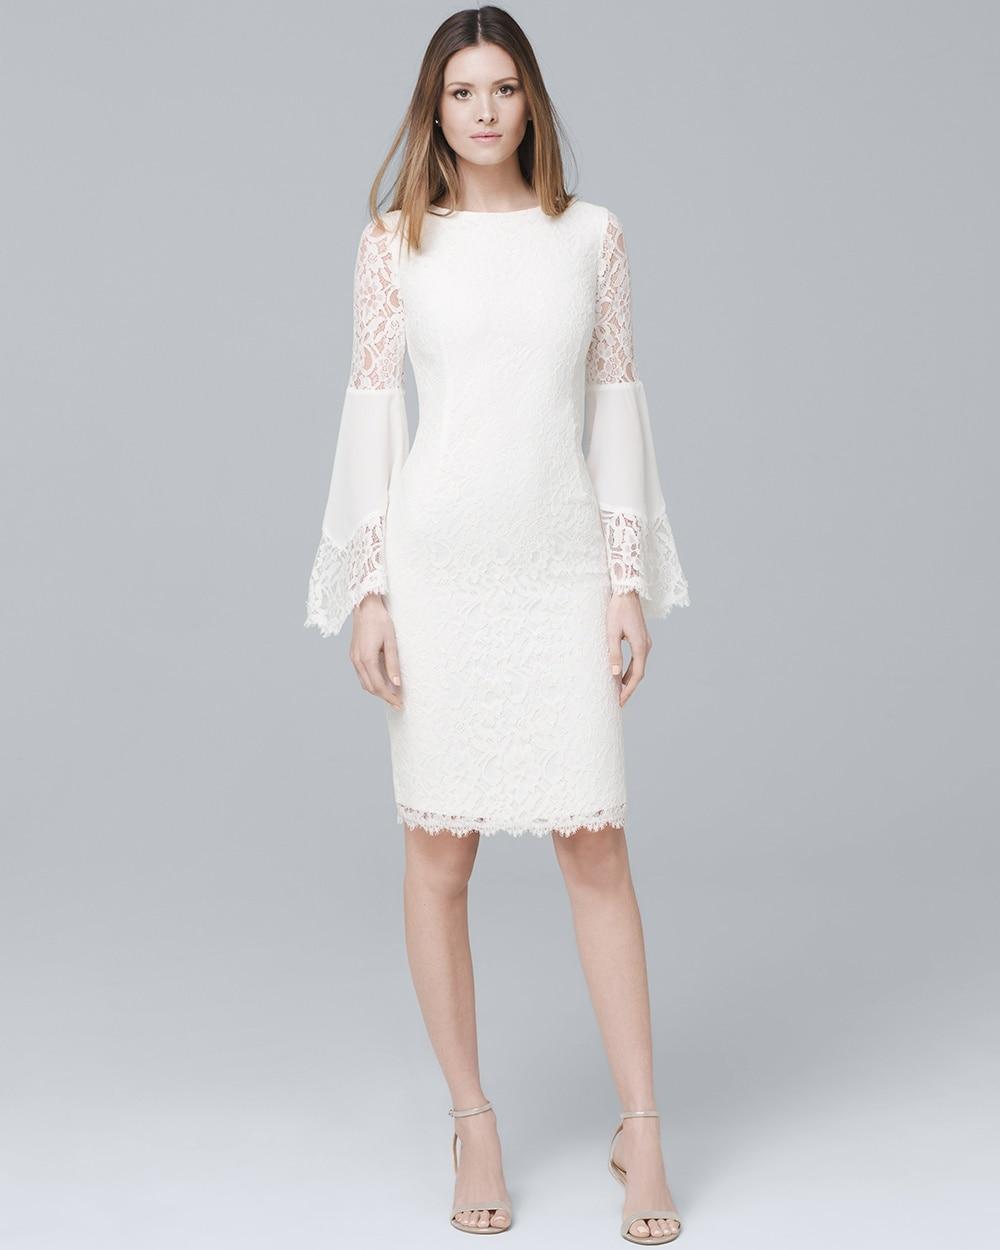 White Lace Bell Sleeve Sheath Dress